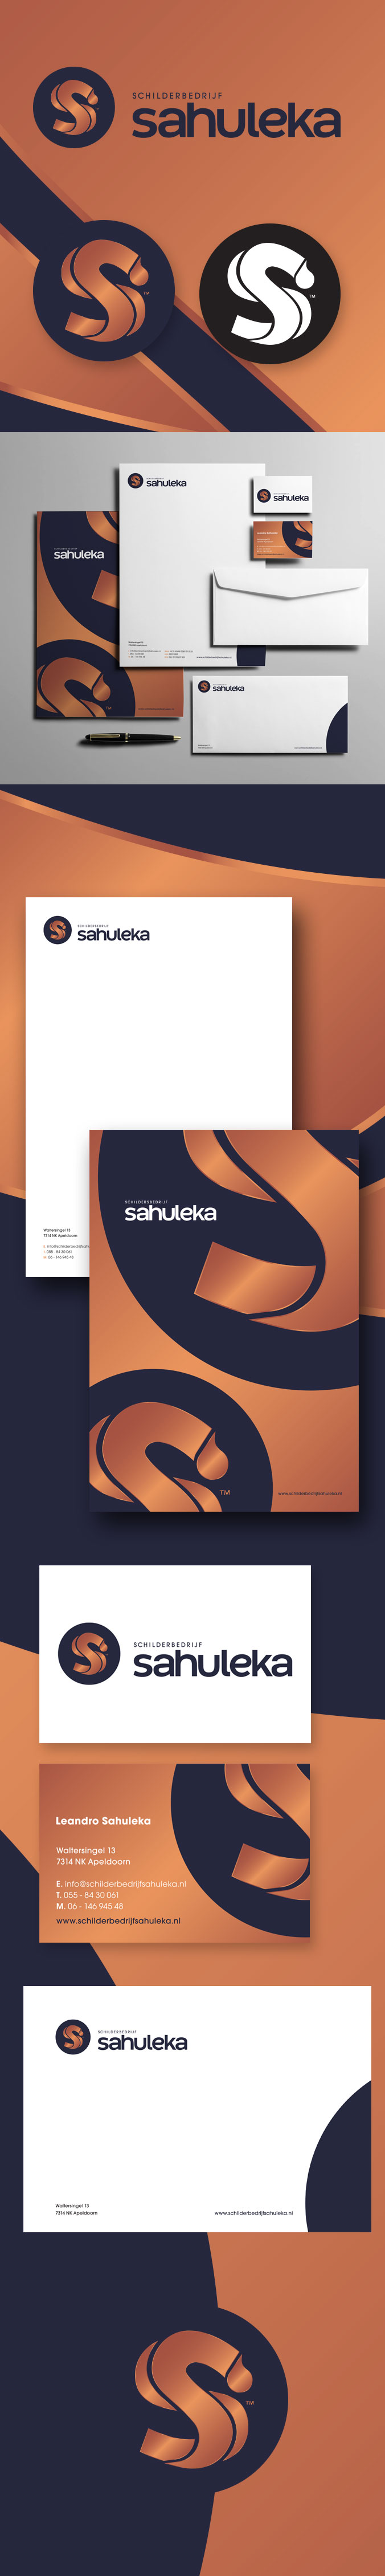 Sahuleka Schildersbedrijf